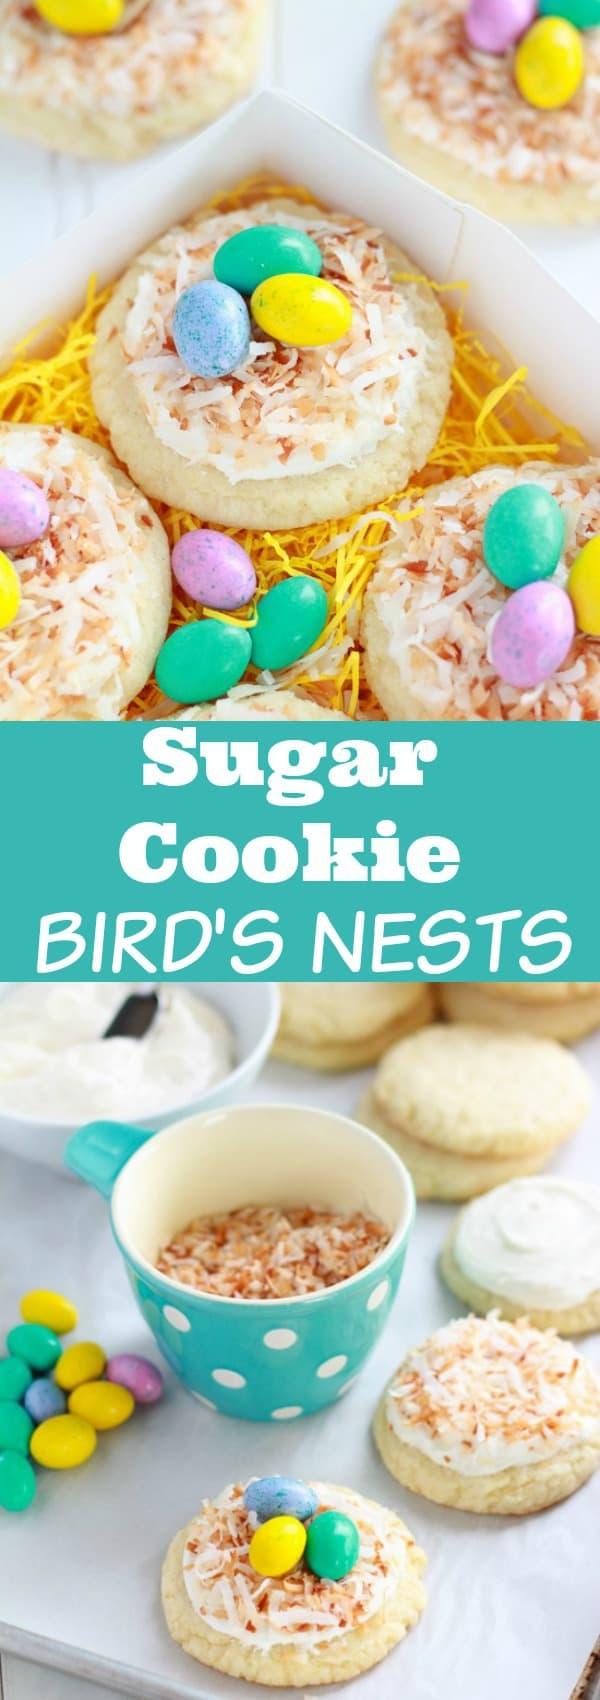 Sugar Cookie Bird's Nests - A fun Spring or Easter dessert!